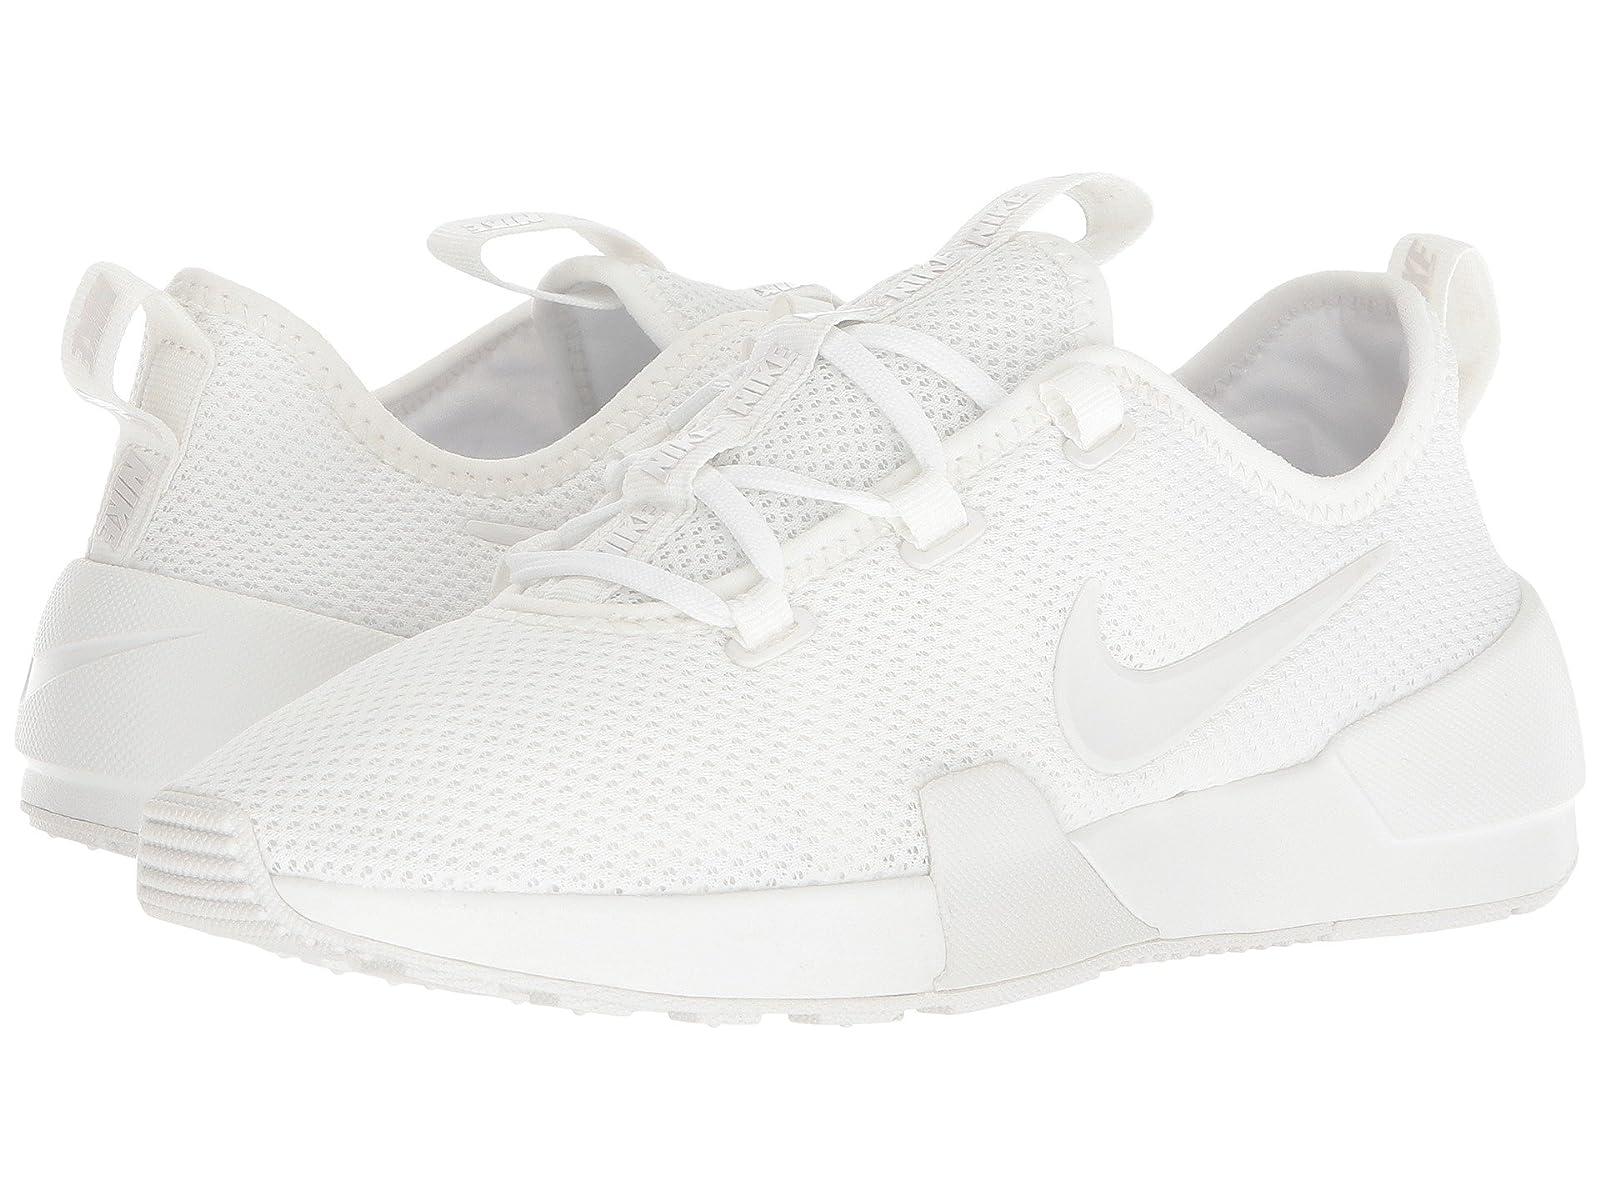 Nike service Ashin Modern:Men's/Women's: Durable service Nike d2ece5